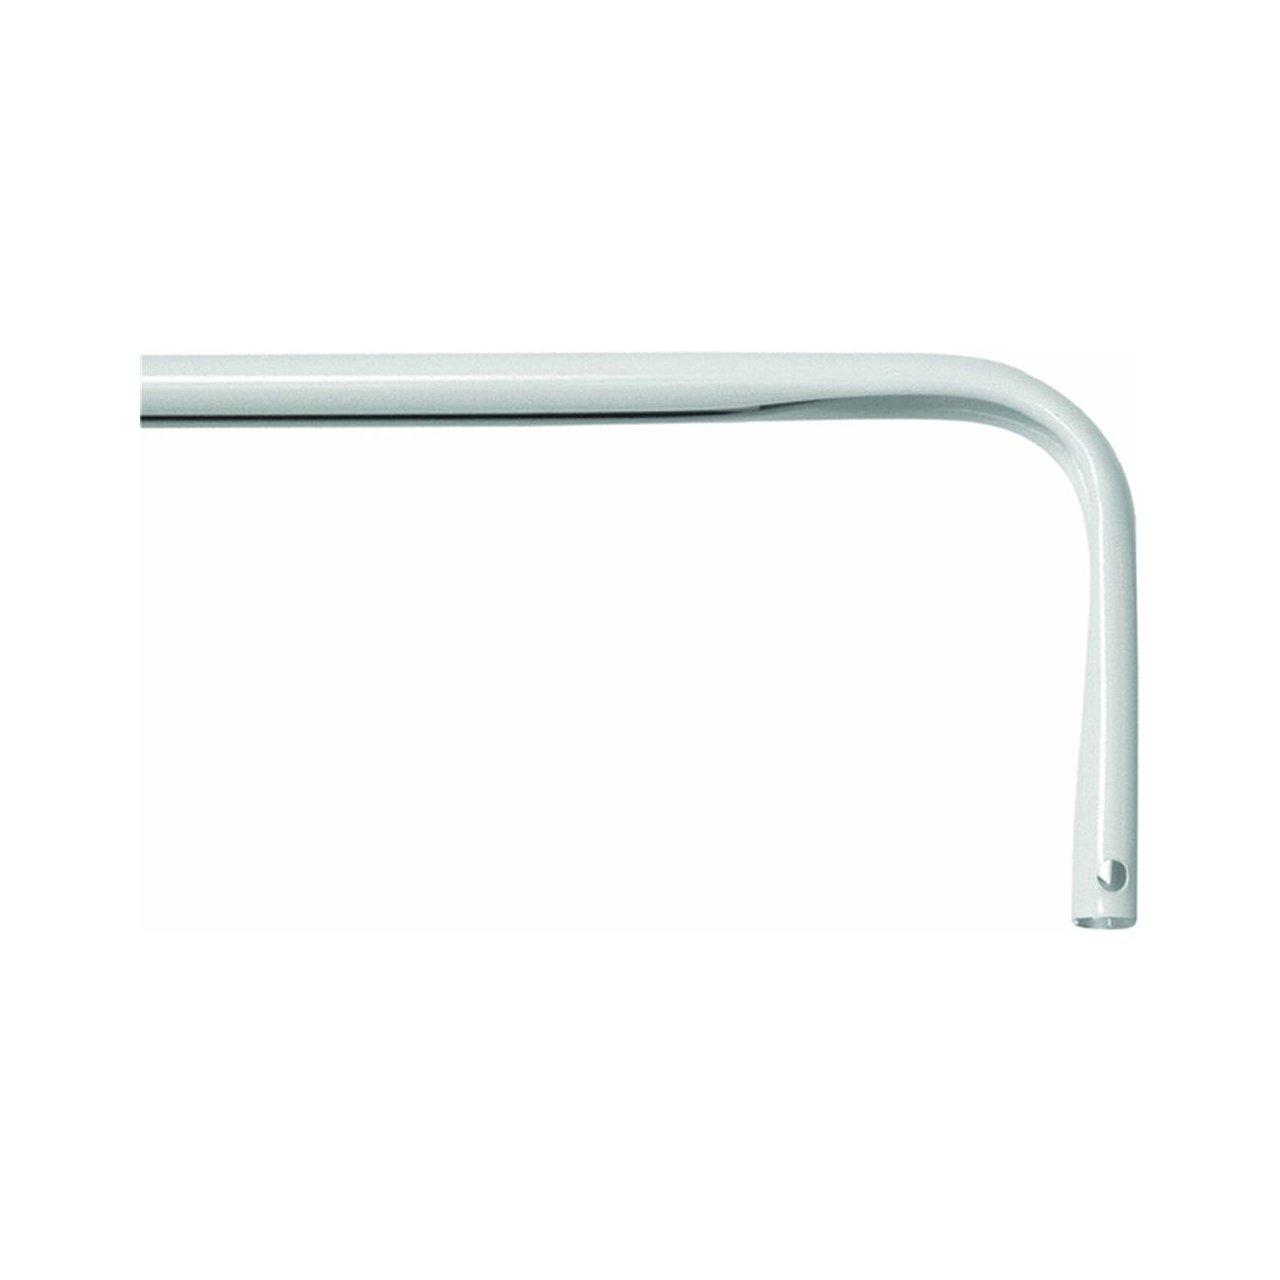 Levolor A7004213283 Heavy Duty Curtain Rod 26 To 45 Inch Width White New Fr Ebay